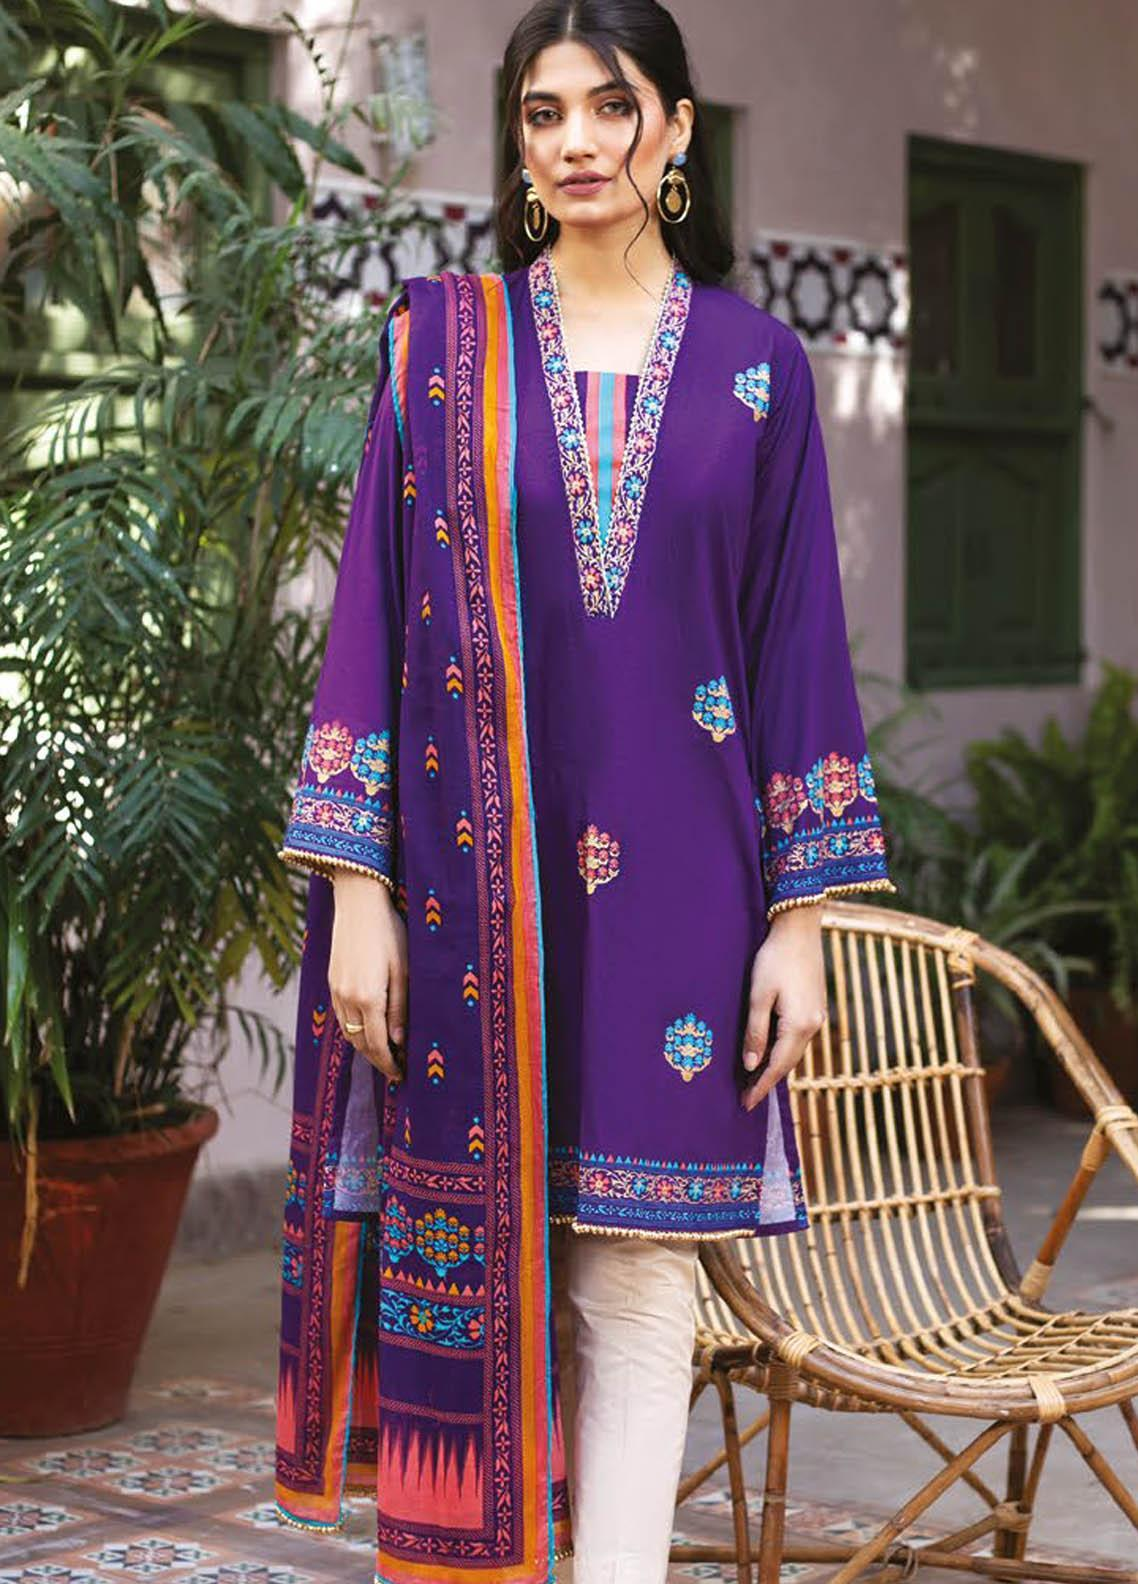 Orient Textile Printed Lawn Suits Unstitched 2 Piece OTL-21-029 Purple - Summer Collection